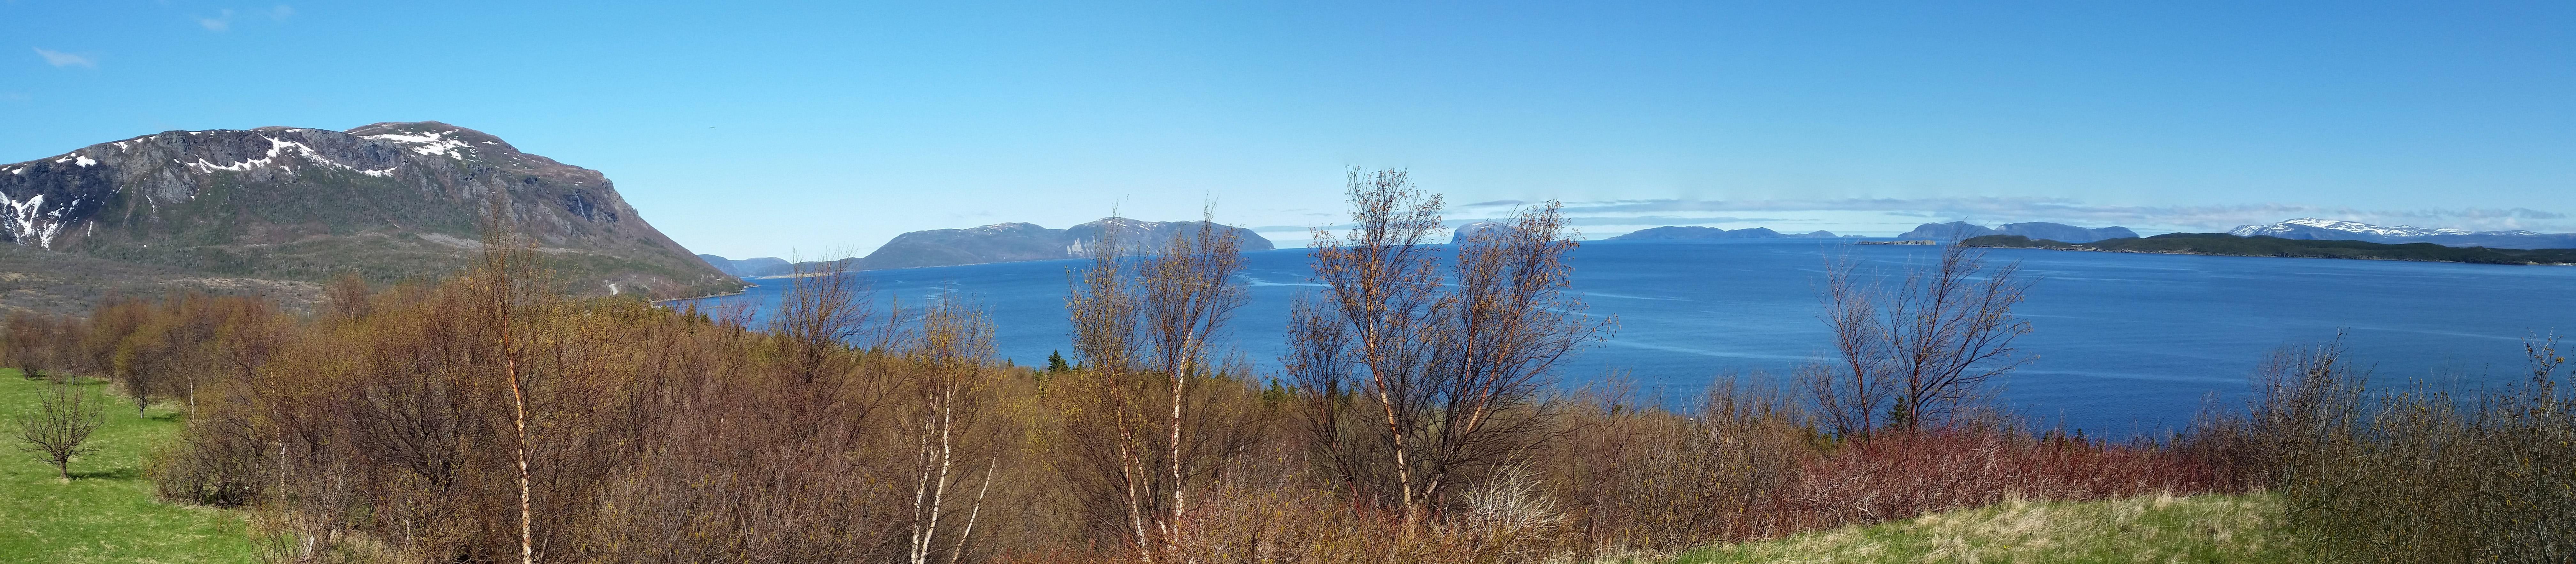 Newfoundland Bay of Islands